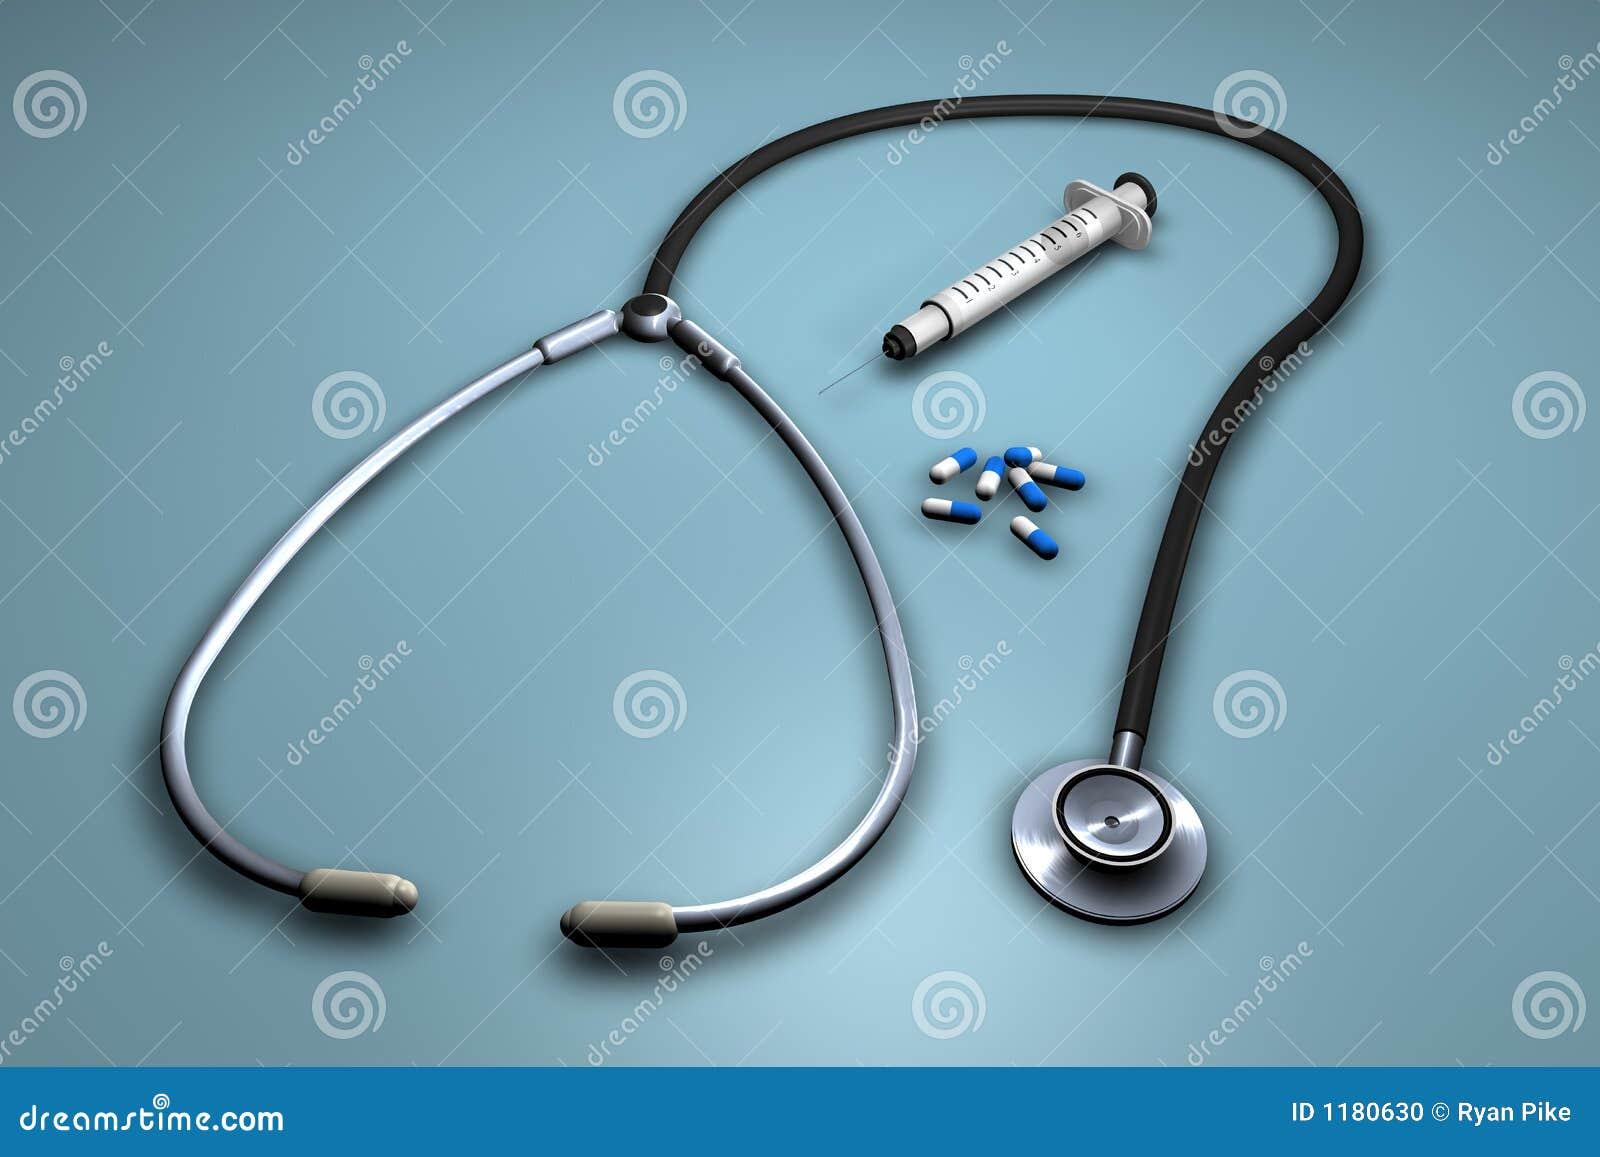 Ago, pillole e stethascope